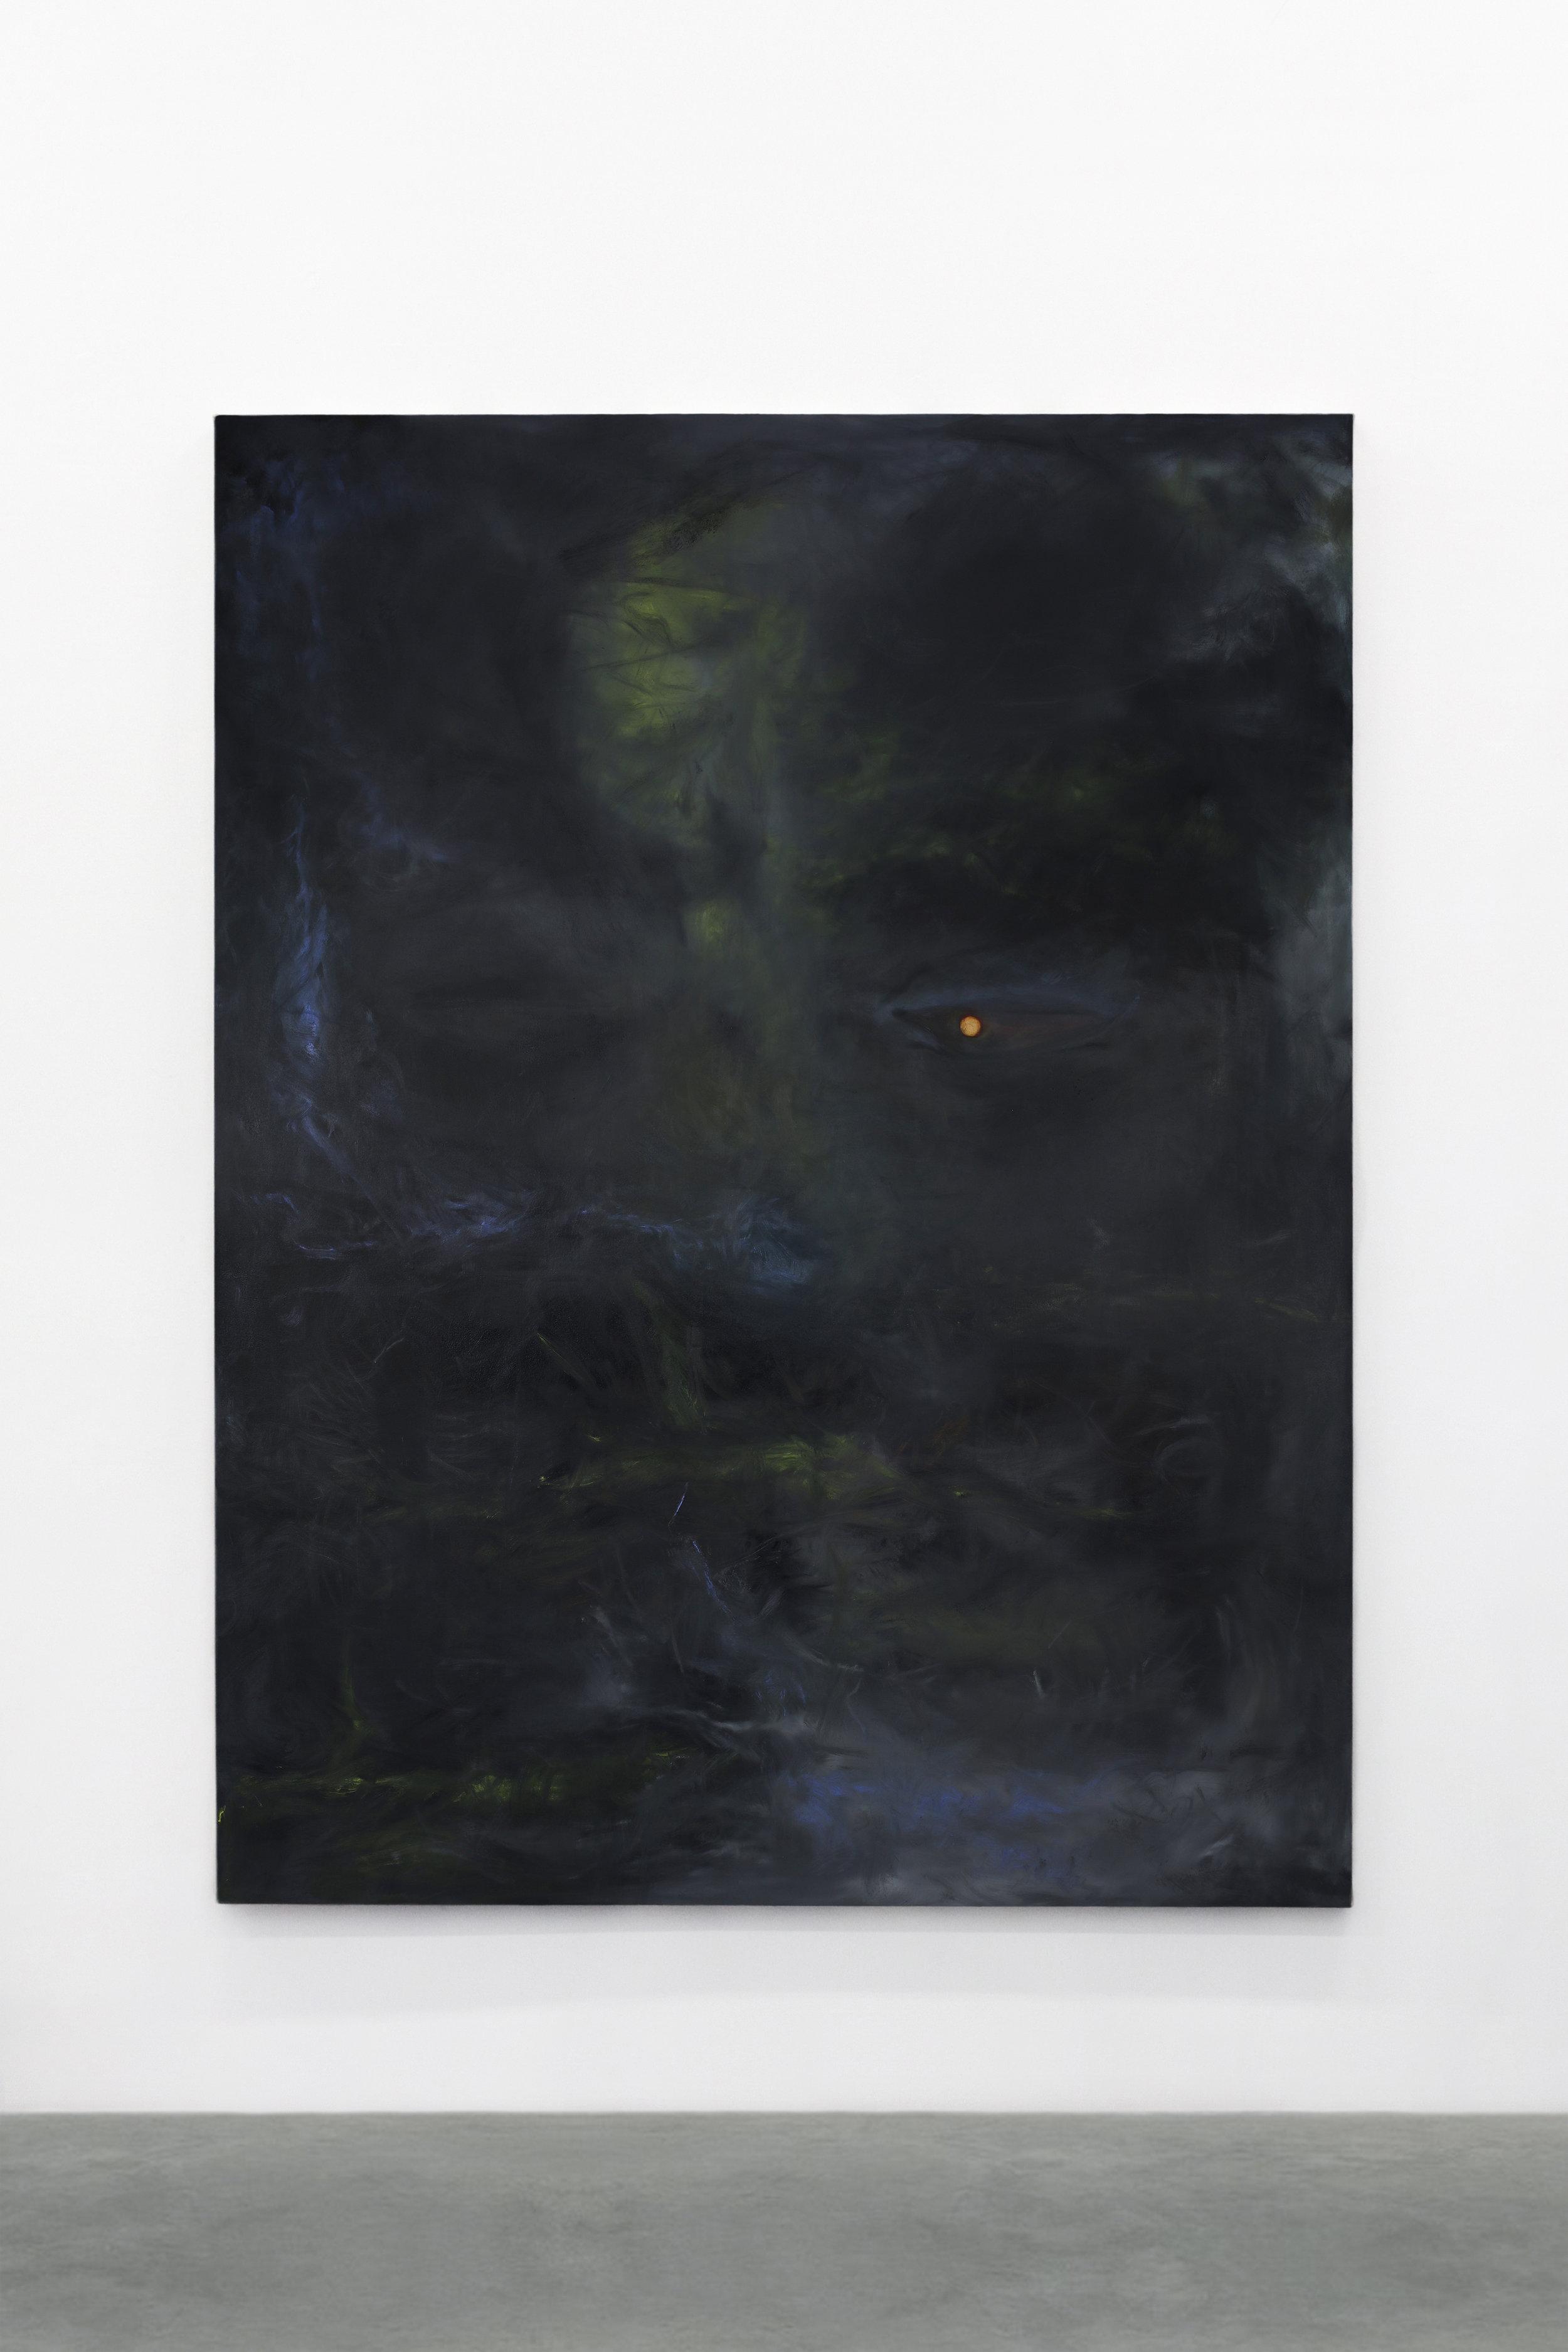 S. Derviz, Unititled, oil on canvas, 200x160cm, 2018